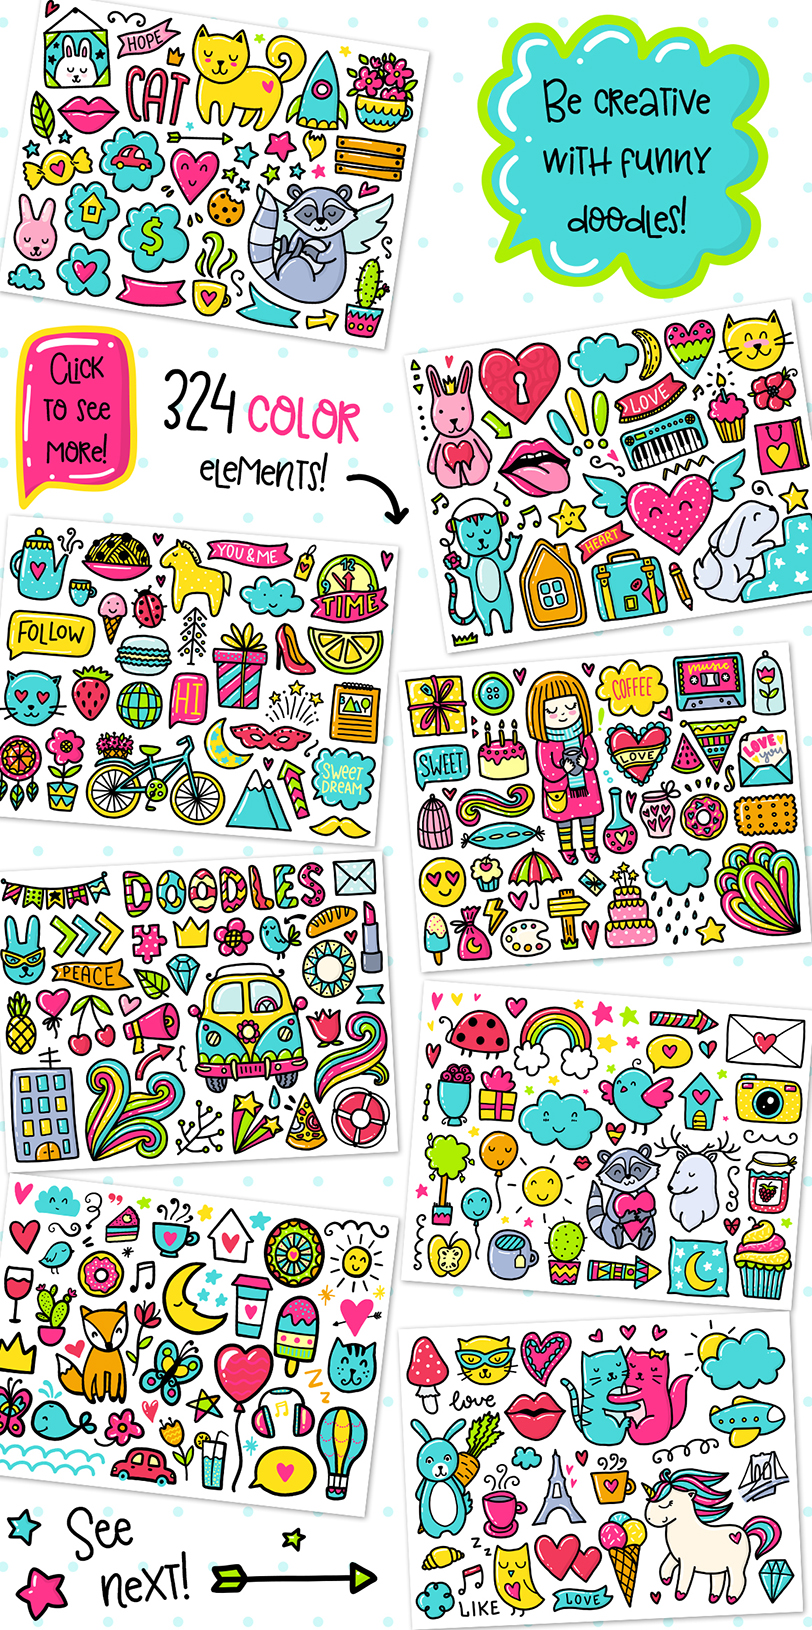 700 Doodles & Patterns - Clipart Set example image 2